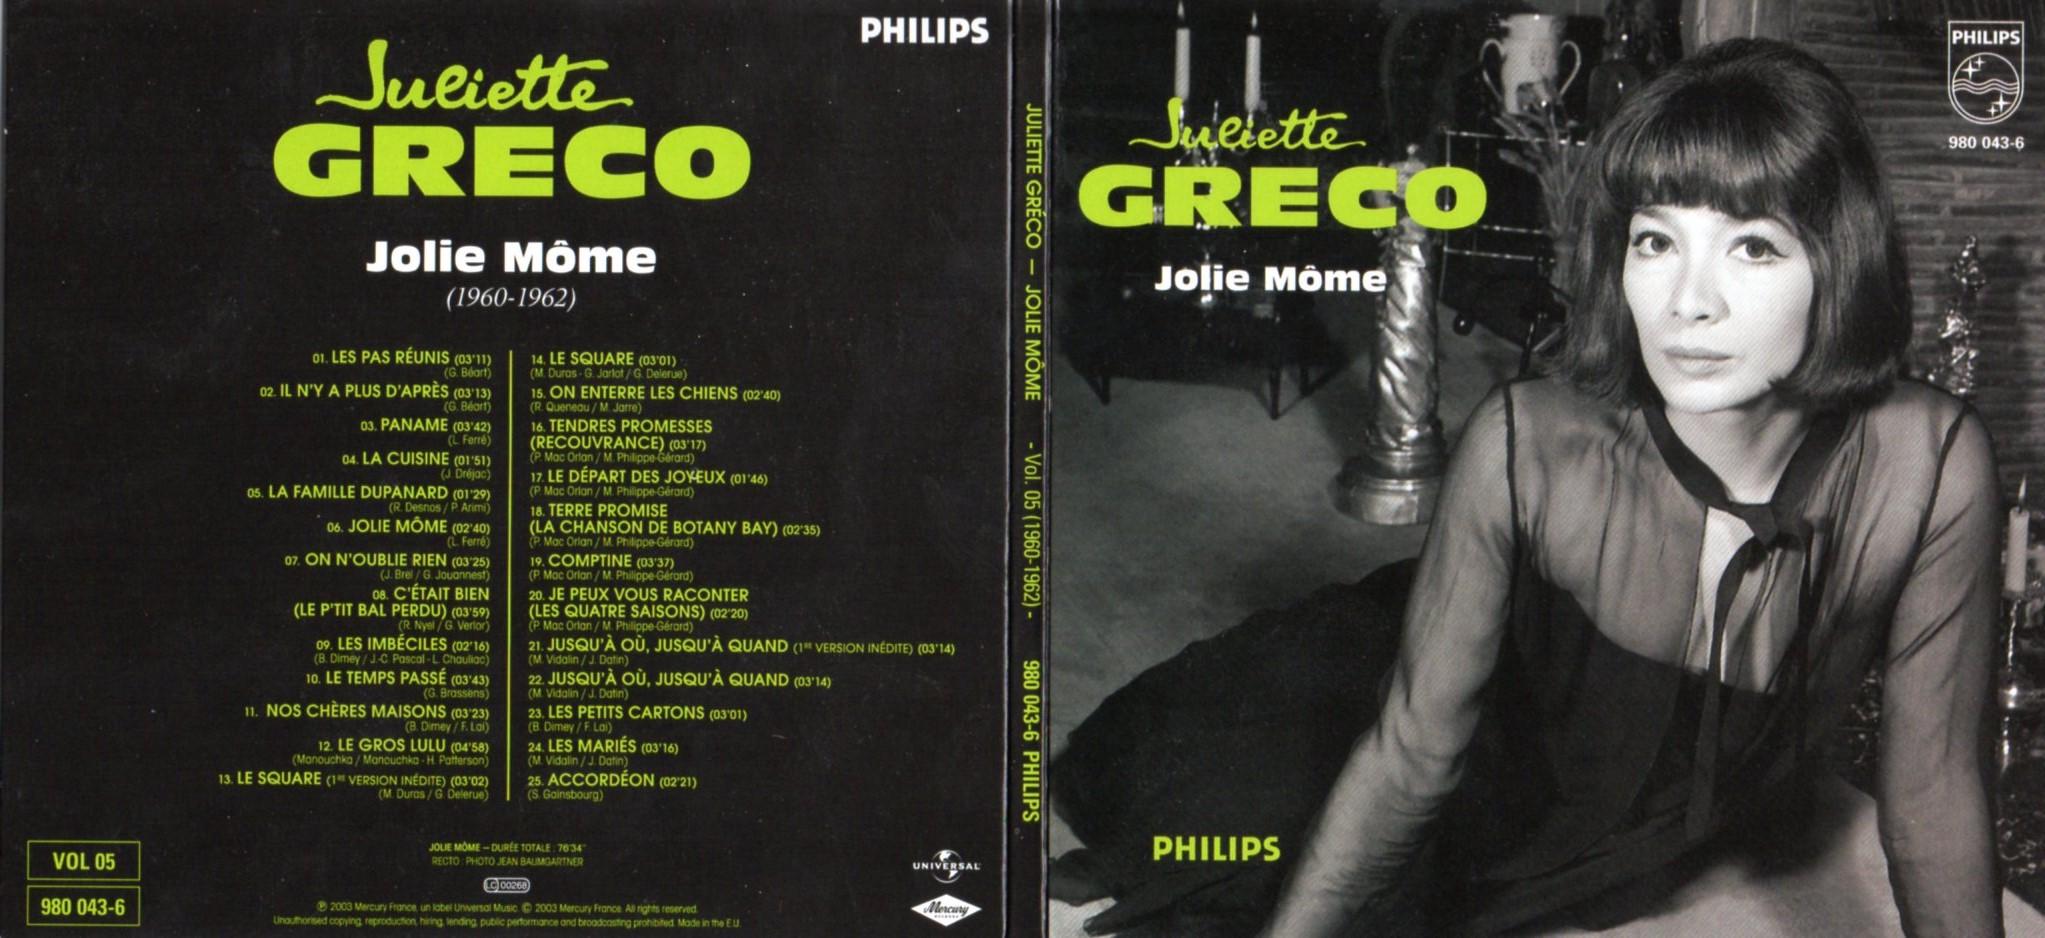 JULIETTE GRÉCO - Jolie môme (1960 - 1962) Gatefold Card board sleeve - CD